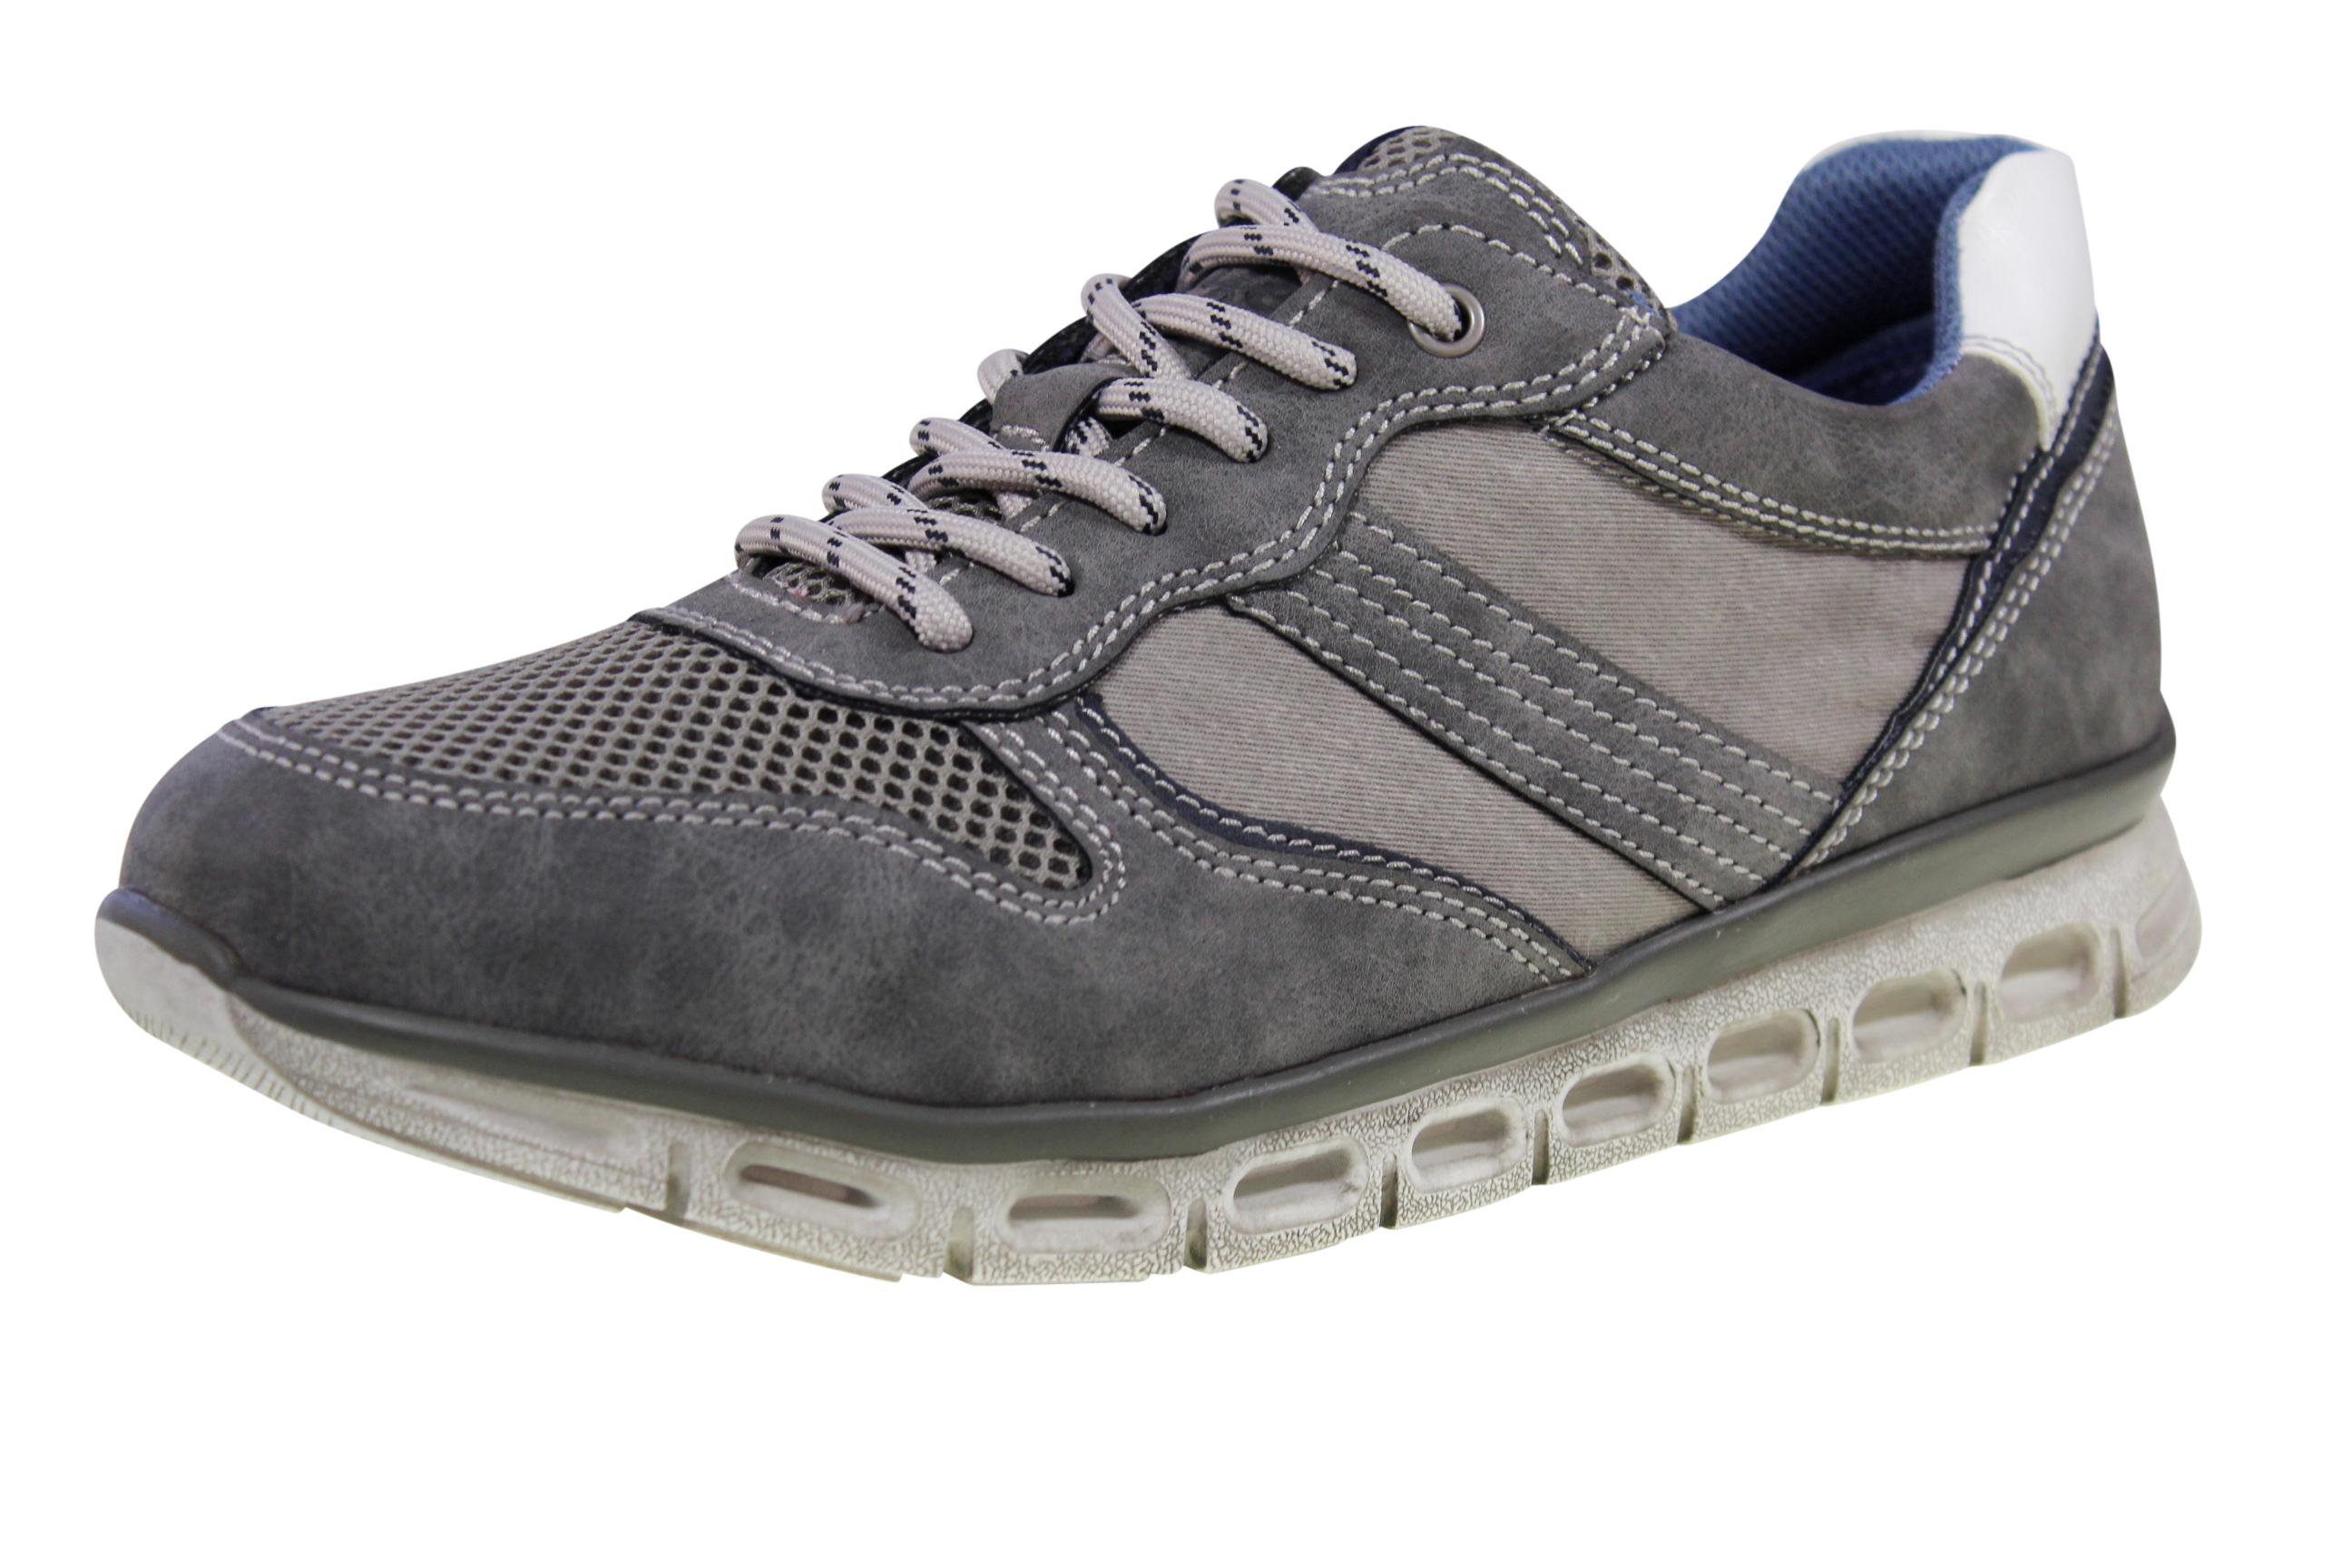 Details zu NEU Relife Komfort Herren Schuhe Sneaker Shoes Halbschuhe Schnürschuhe Grau rf13